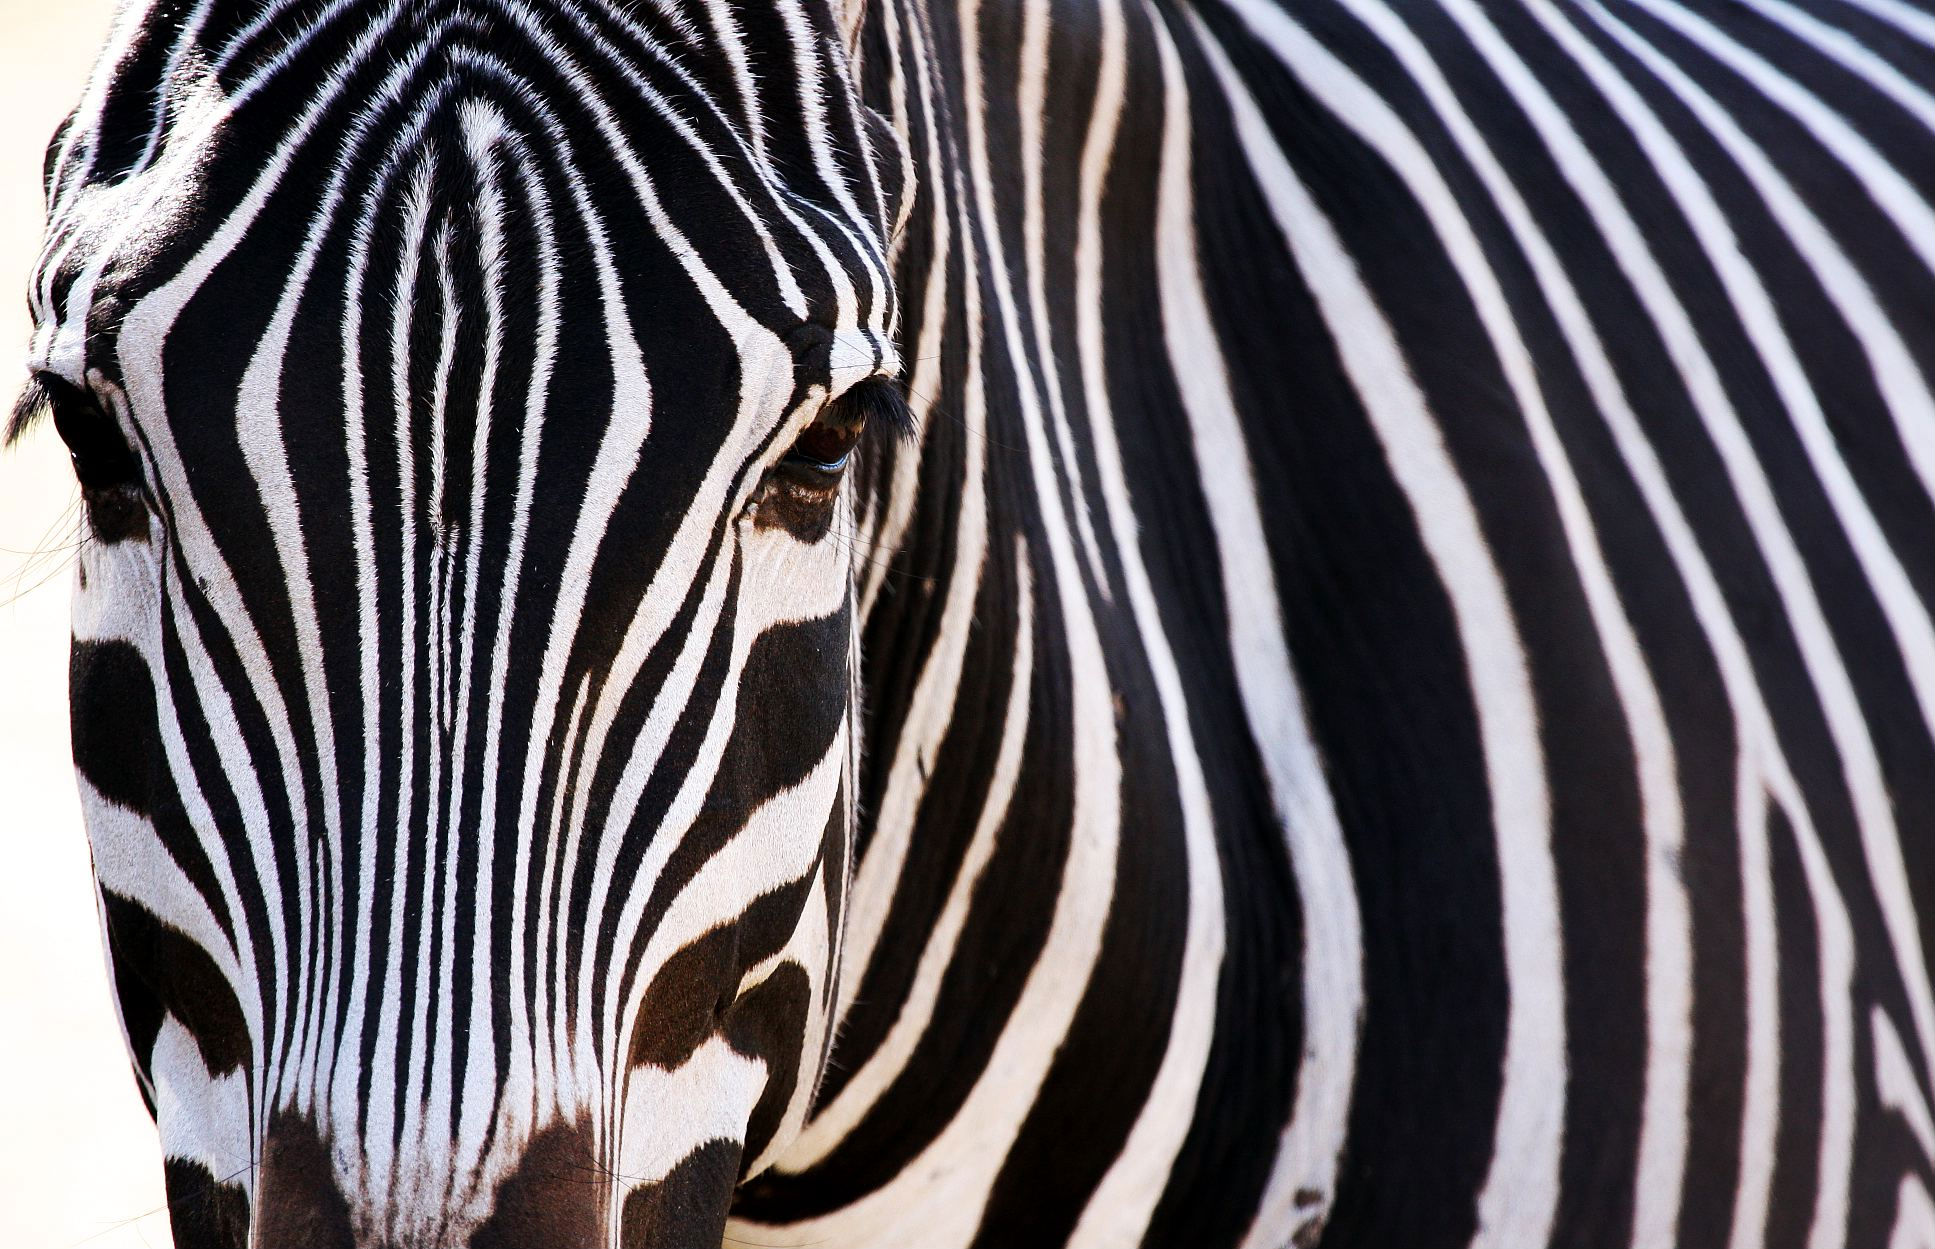 zebra 1080p